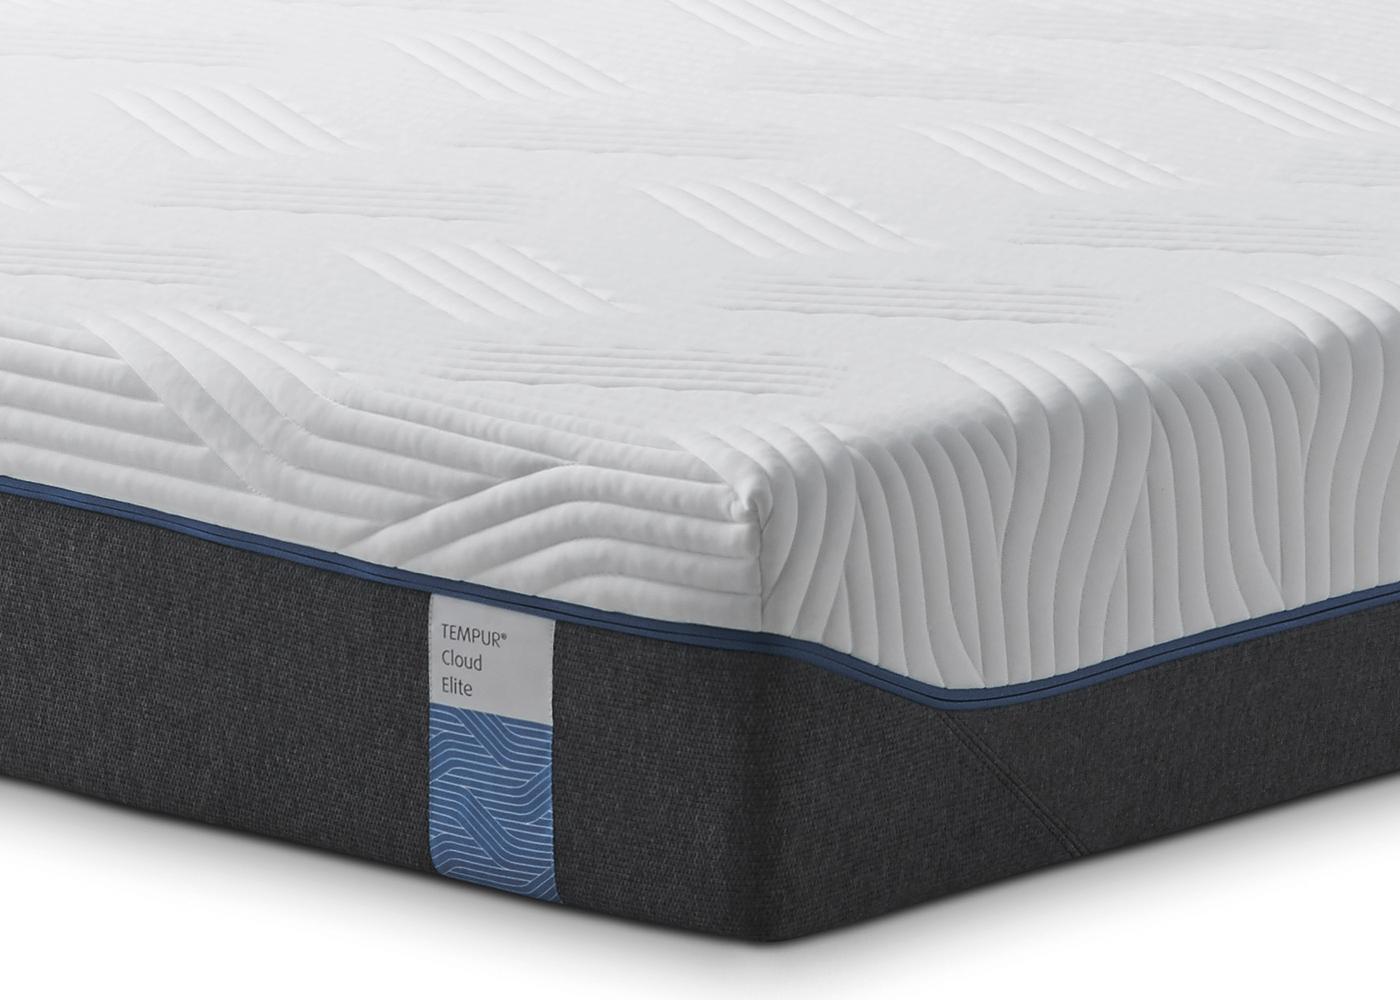 sofas for less uk navy sofa living room tempur® cloud elite mattress - midfurn furniture superstore